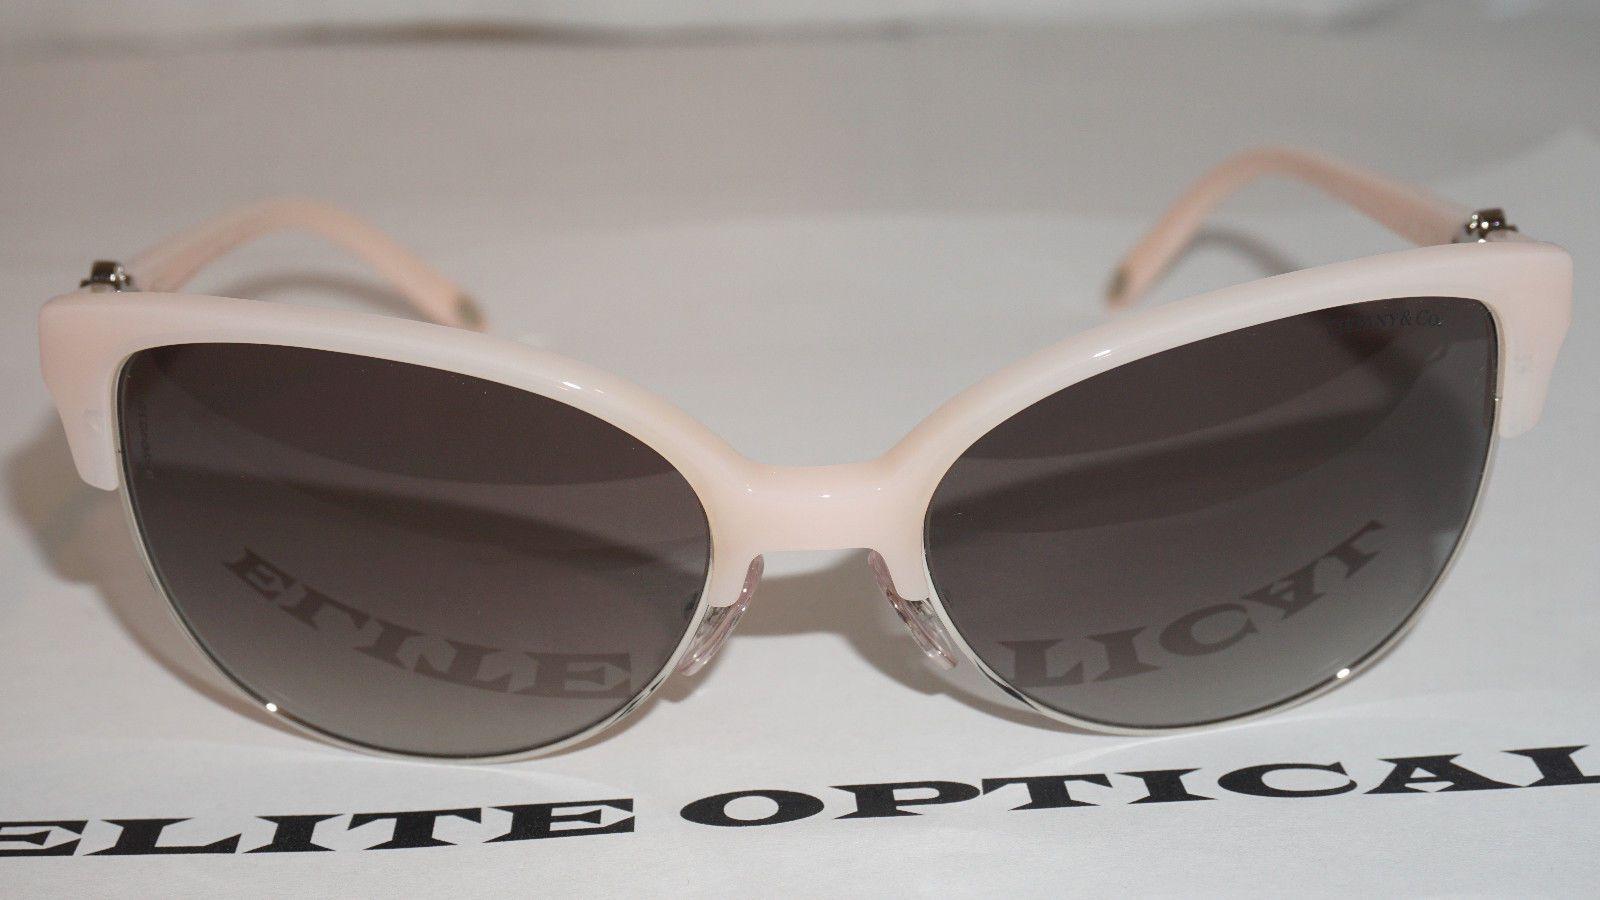 55f9d79dc75 New Authentic TIFFANY   CO. Light Pink Black Gradient TF4080 8162 3C 57 18  140 2